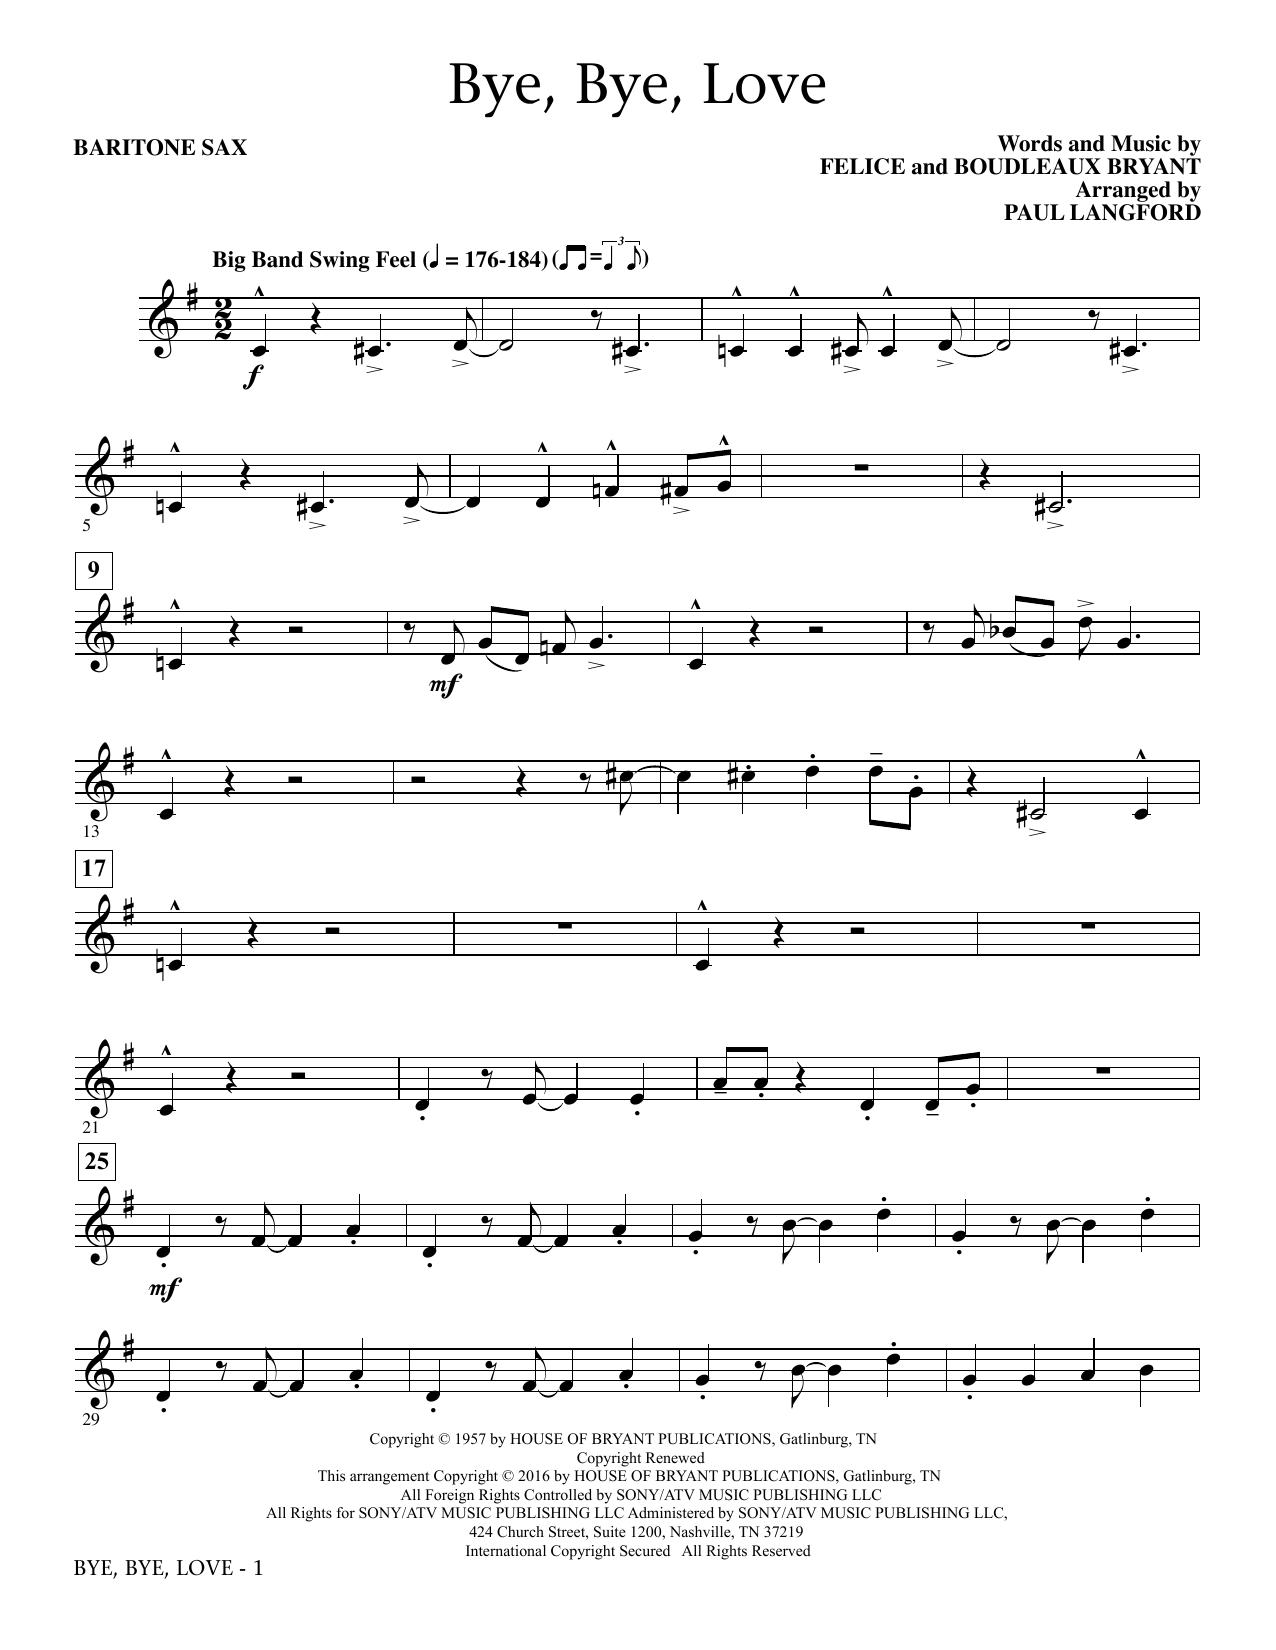 Paul Langford Bye, Bye Love - Baritone Sax sheet music notes and chords. Download Printable PDF.